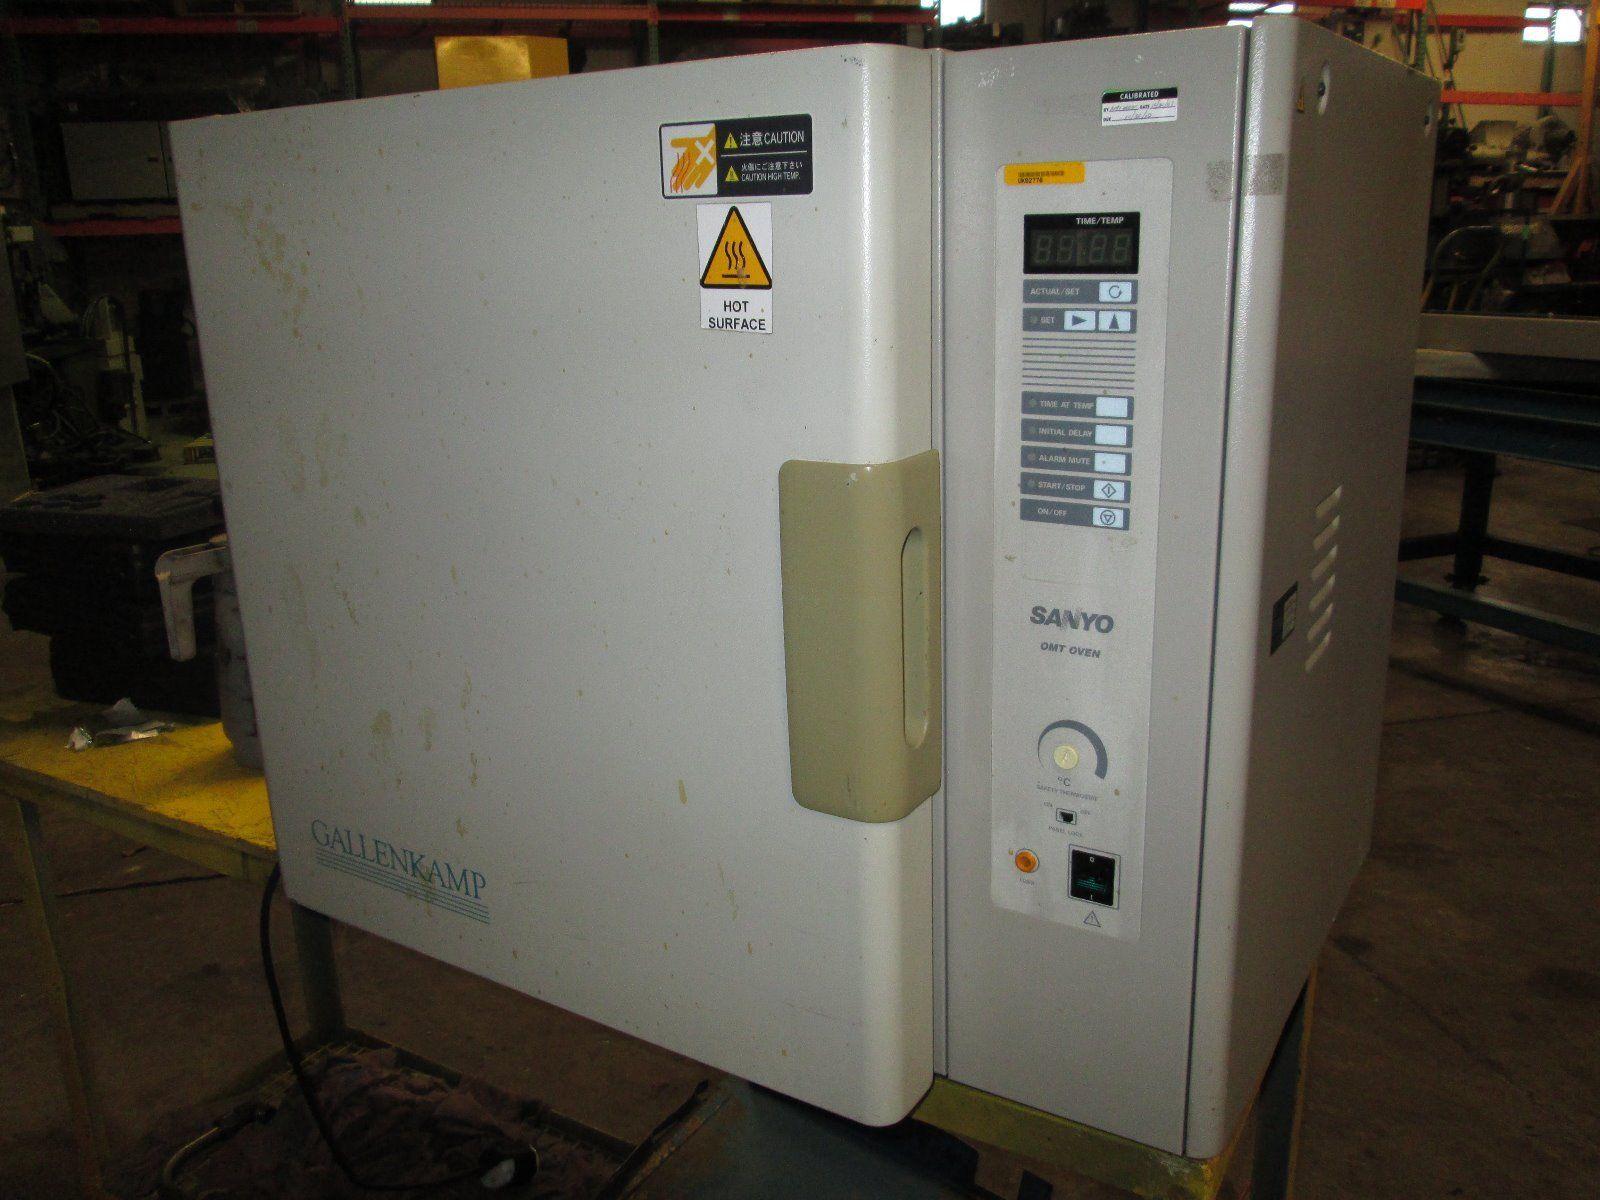 Sanyo Gallen Kamp Laboratory Oven